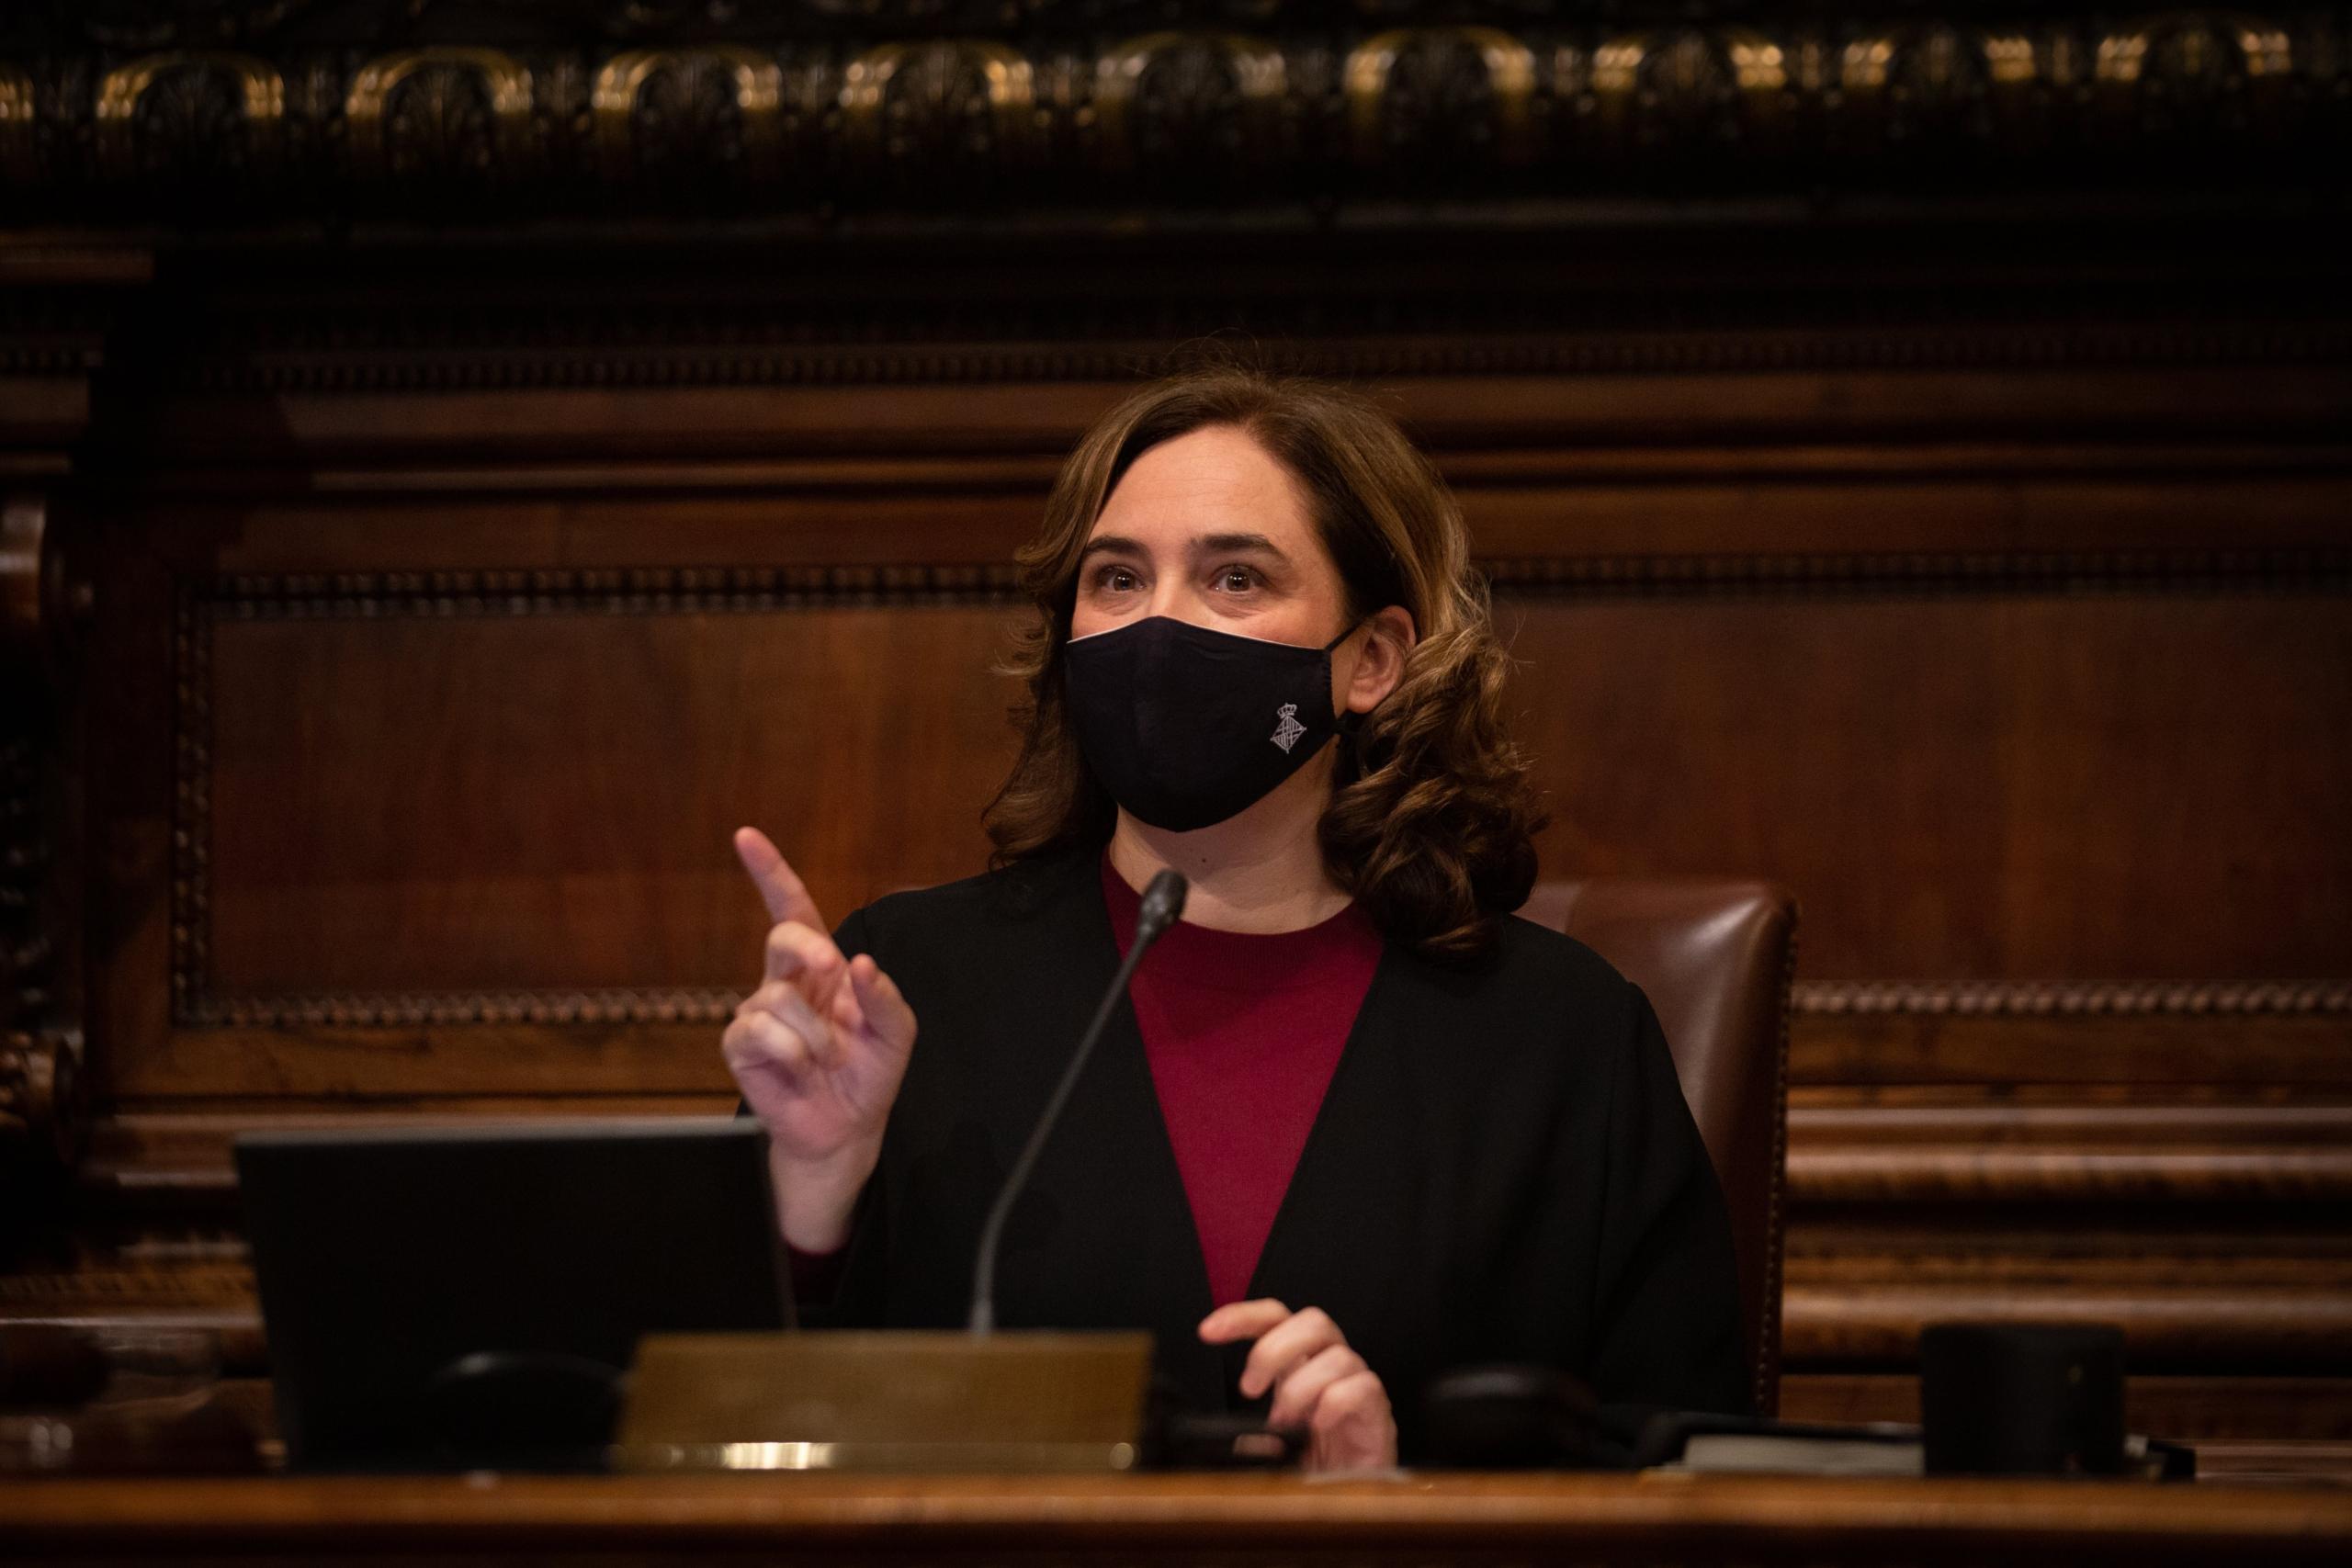 L'alcaldessa Ada Colau en imatge d'arxiu / David Zorrakino (Europa Press)